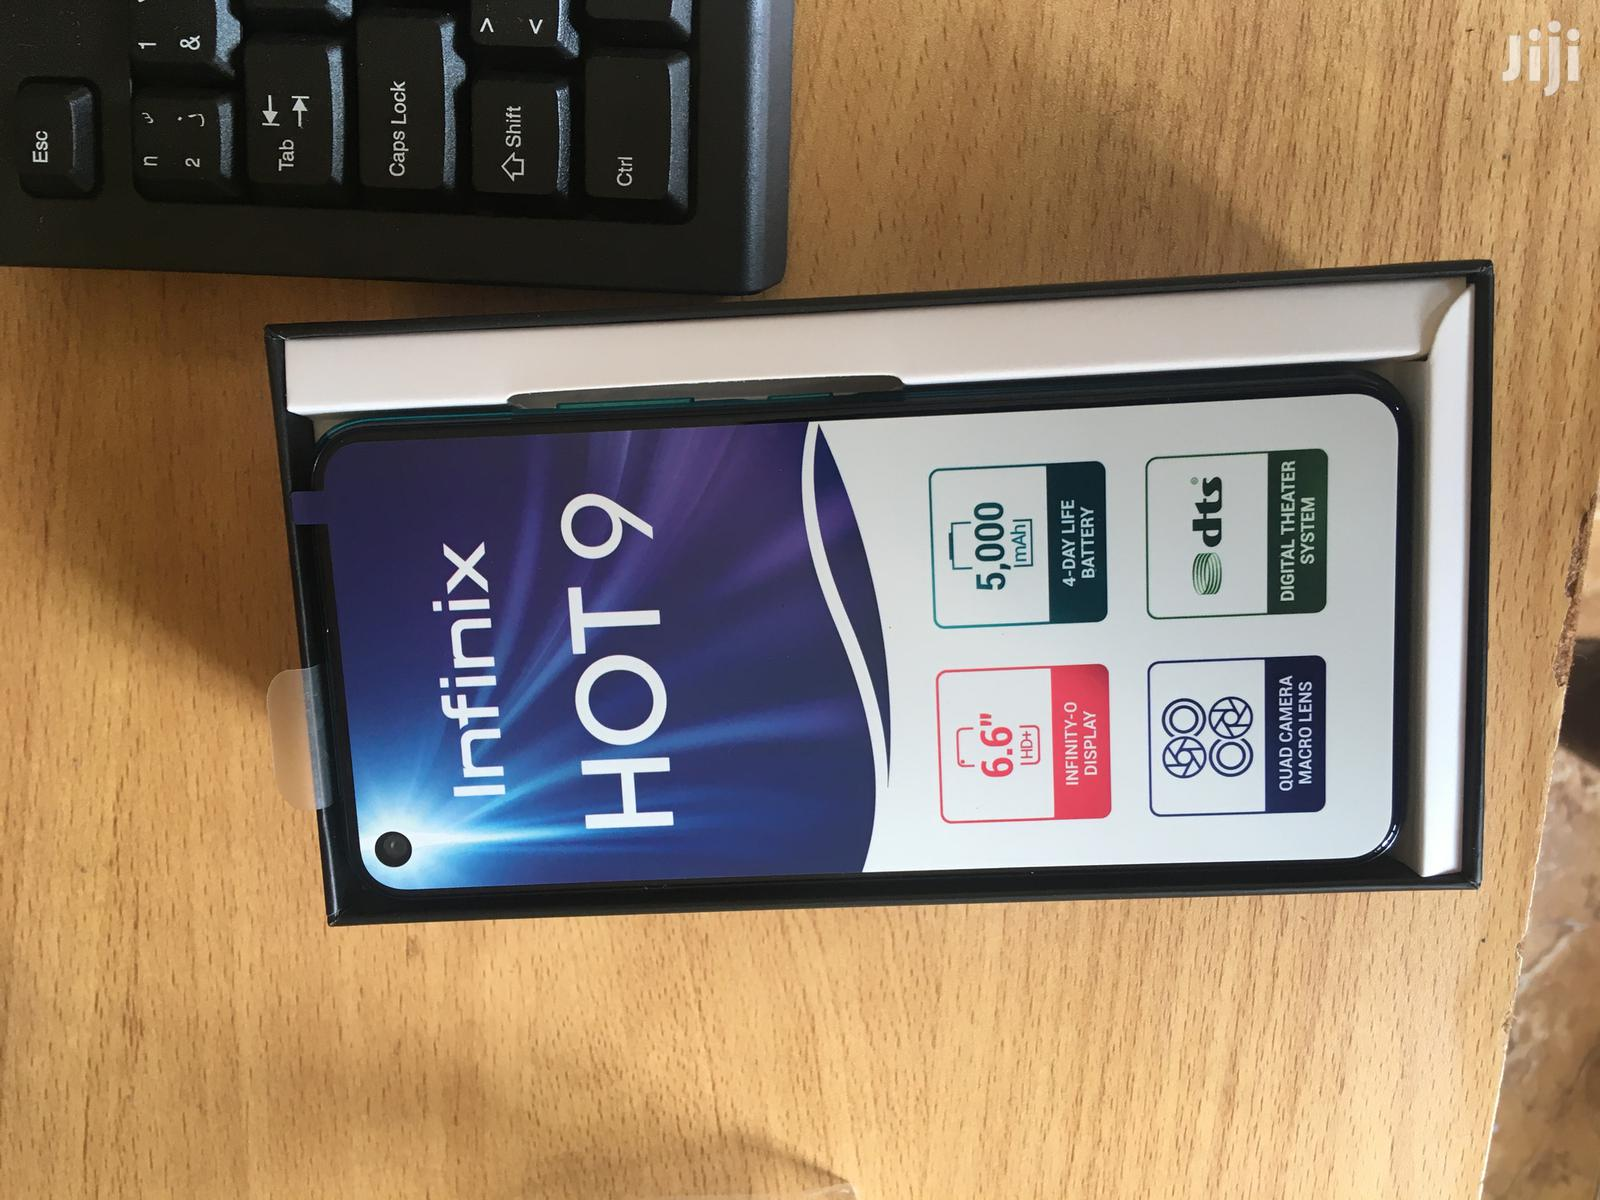 New Infinix Hot 9 32 GB Blue   Mobile Phones for sale in Kampala, Central Region, Uganda